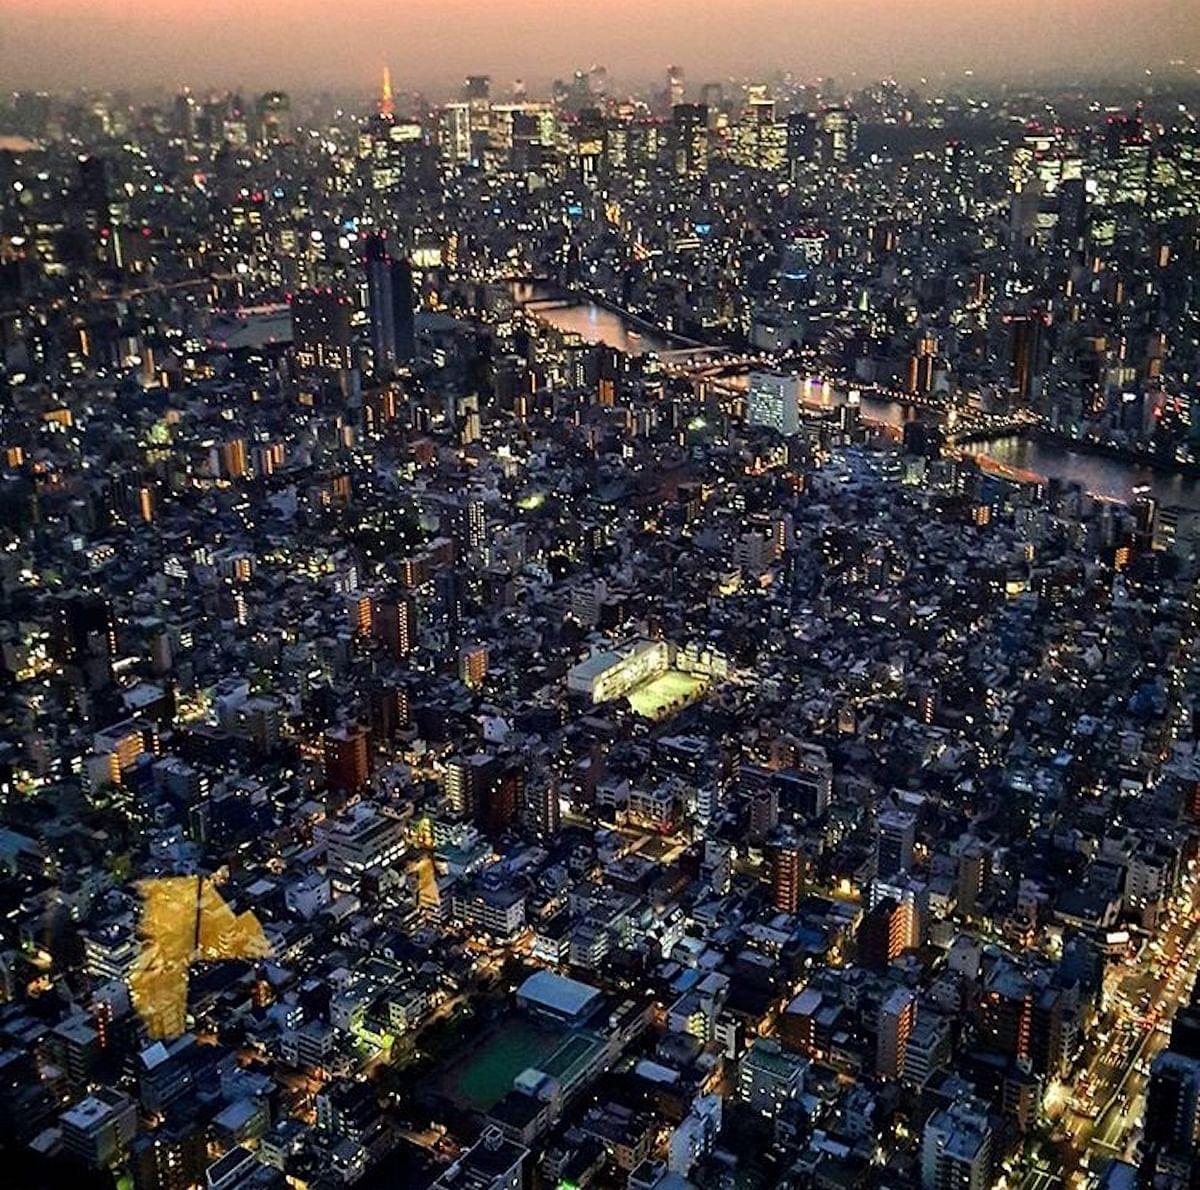 Tokyo skyline from the Skytree. (Photo Courtesy: Ashwin Rajagopalan)